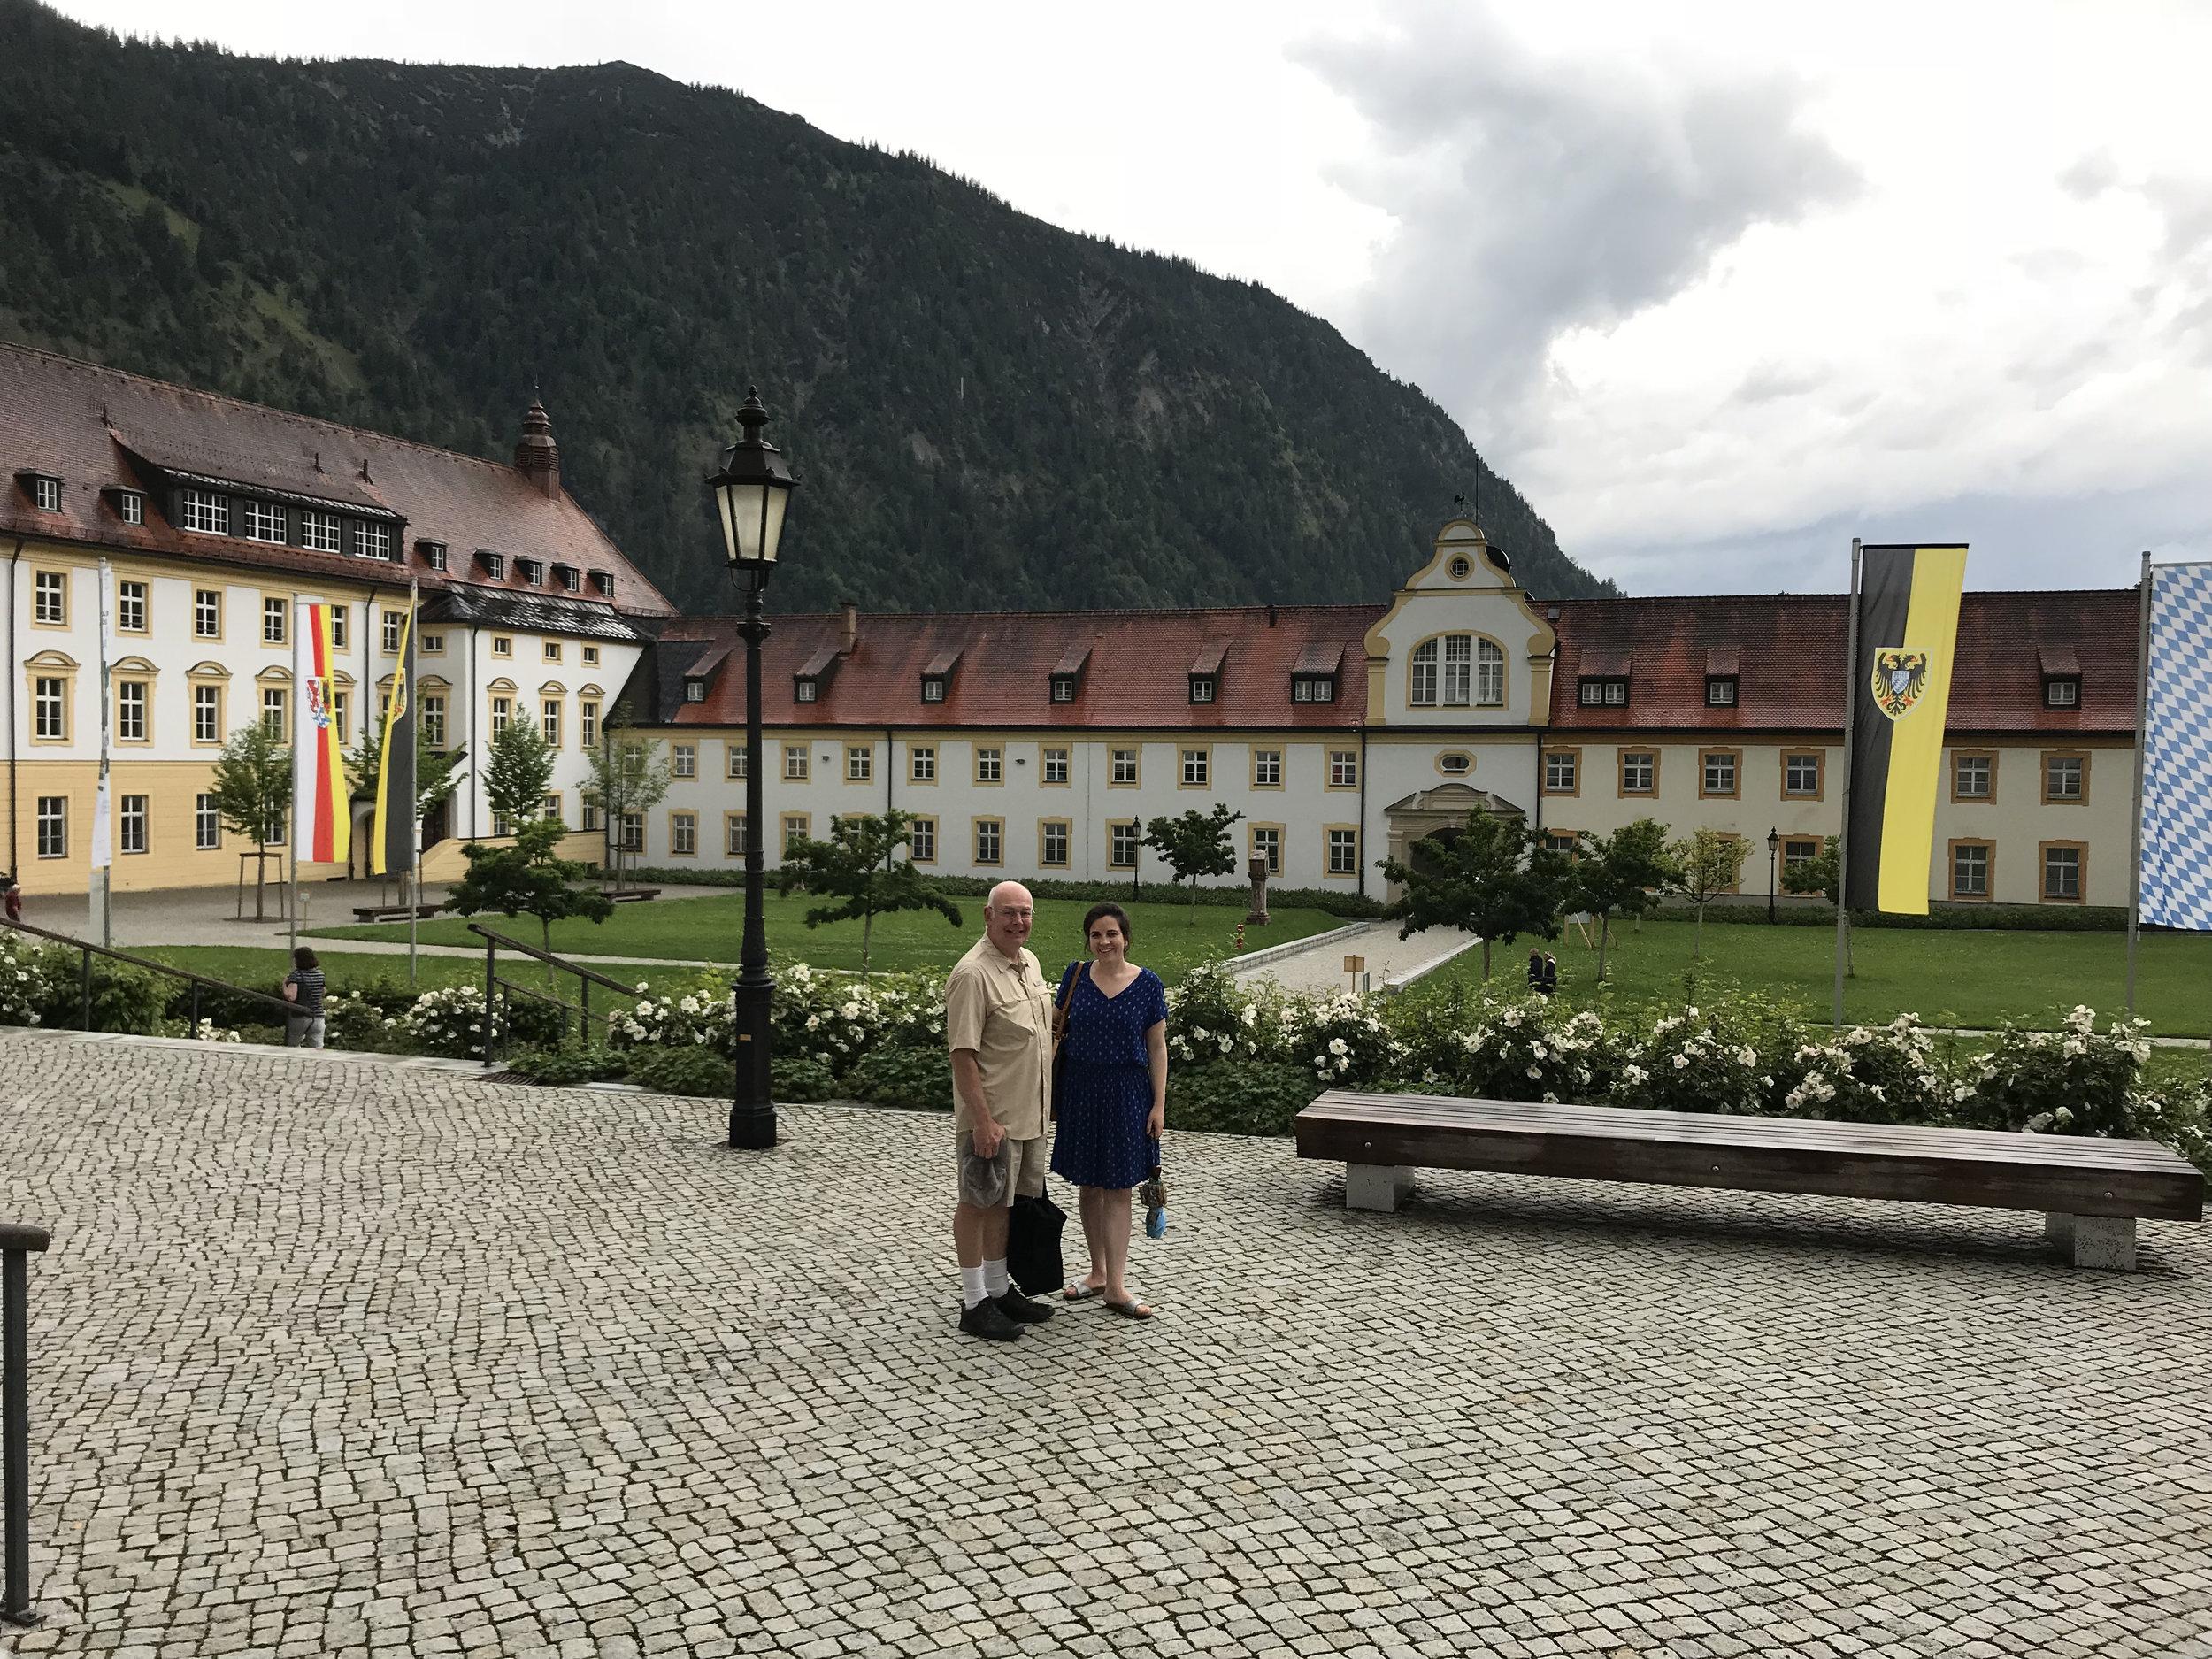 Teri_Bavaria_part3_monastery_spiritedtable_photo28.jpg